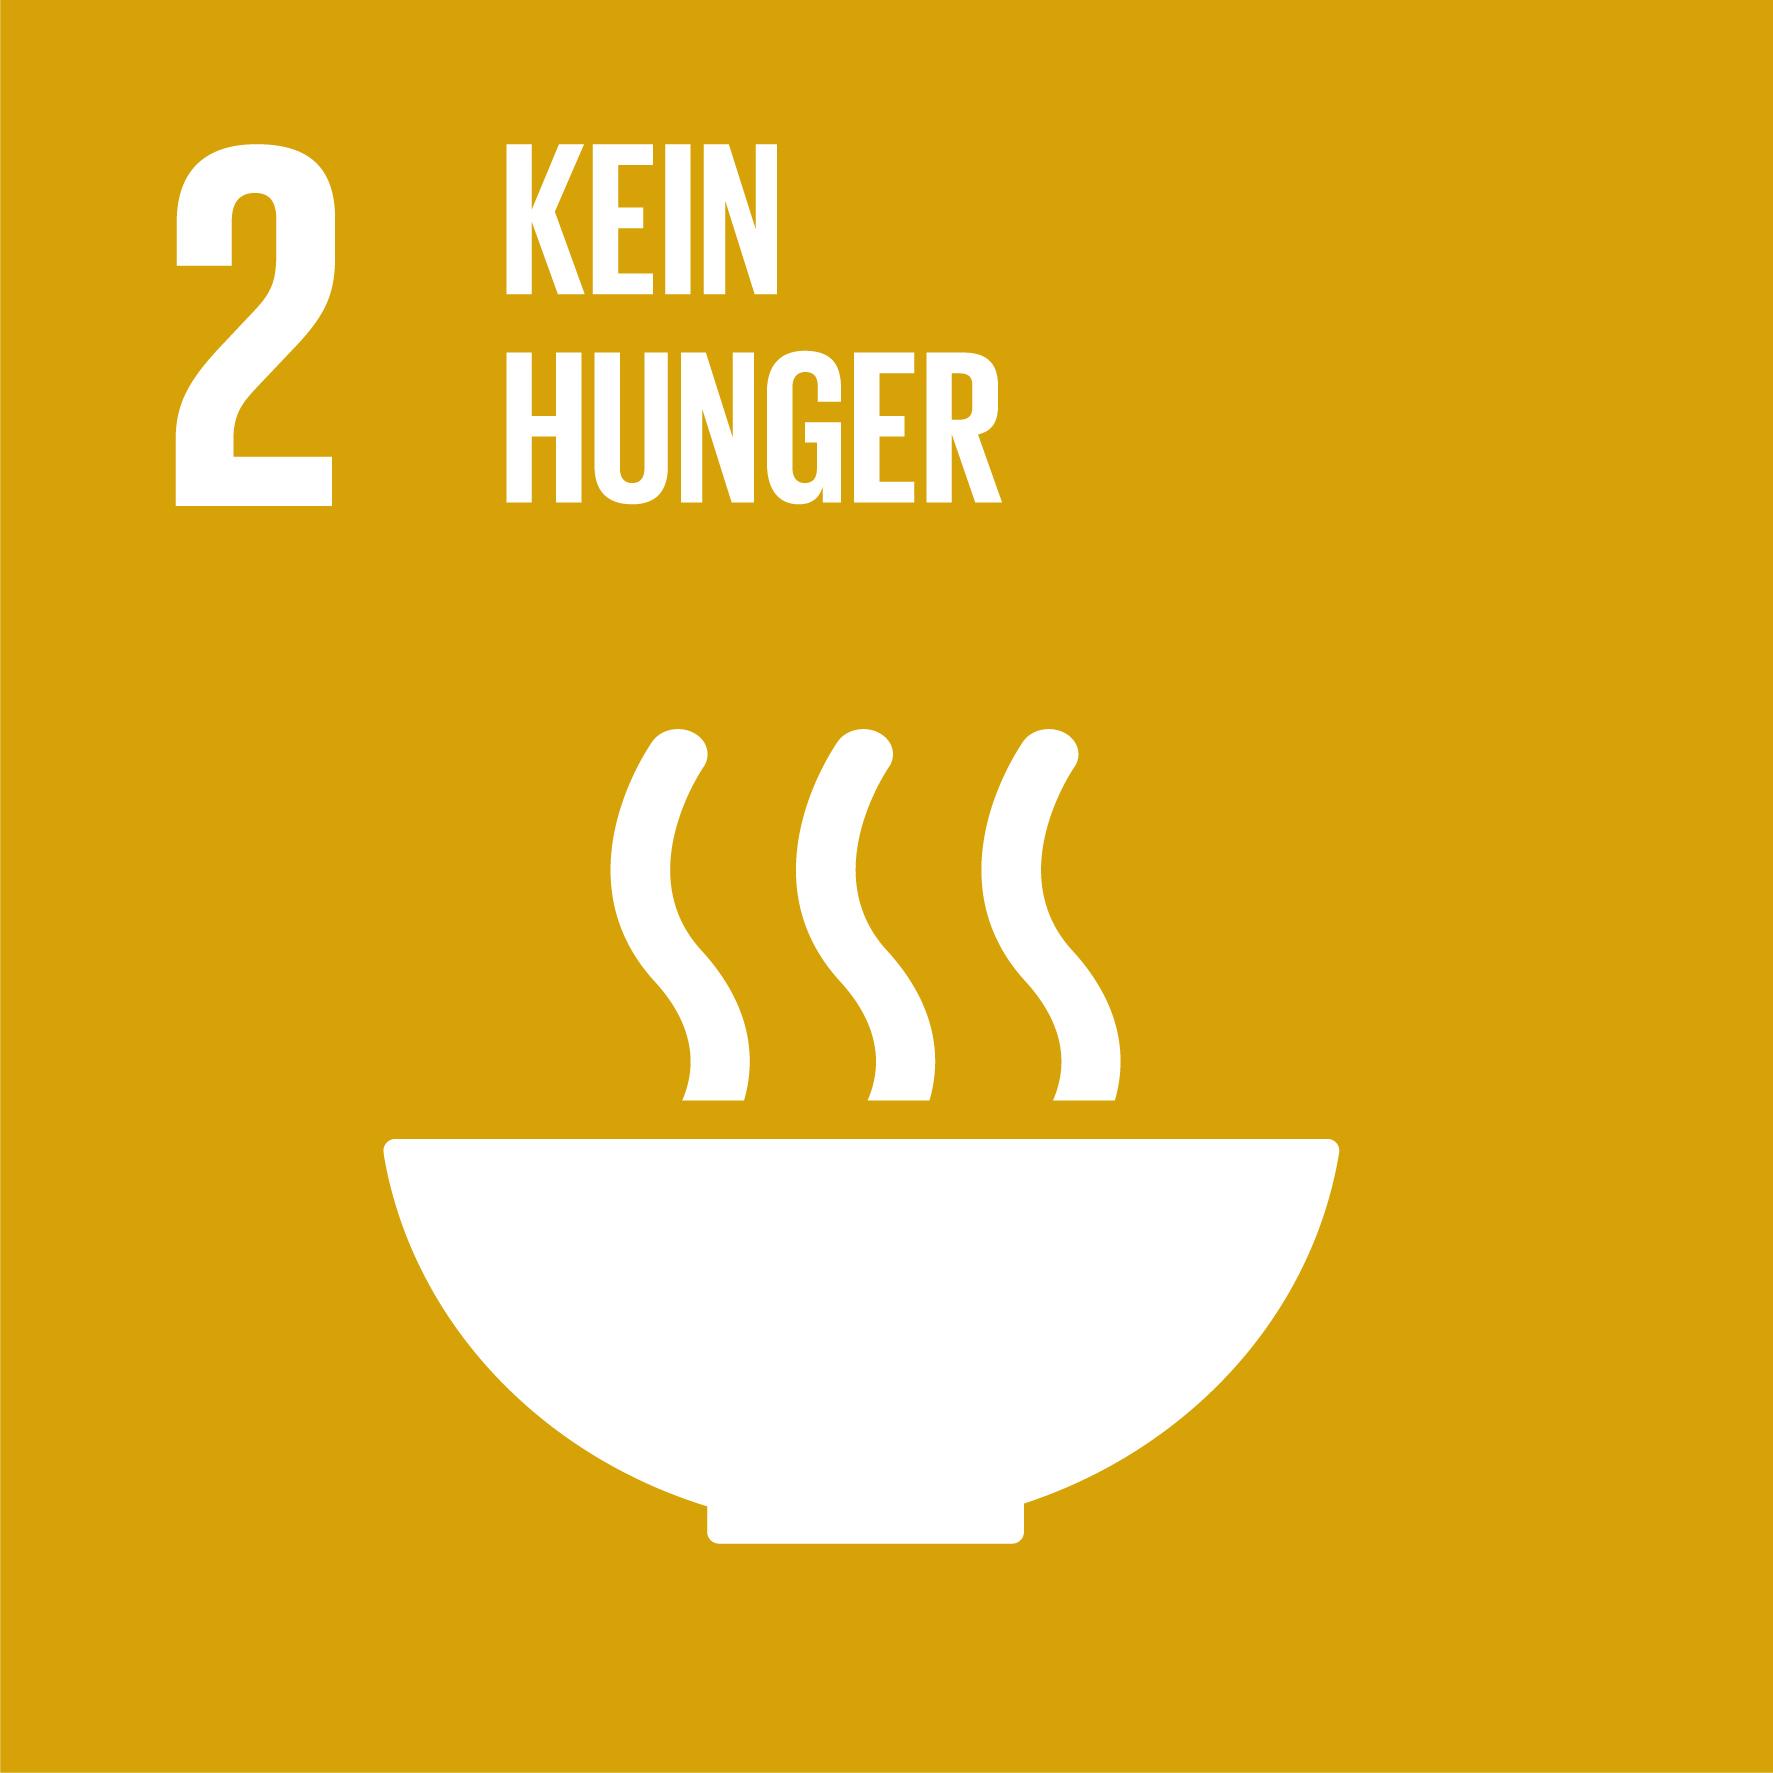 Regensburger Nachhaltigkeitswoche - SDG 2